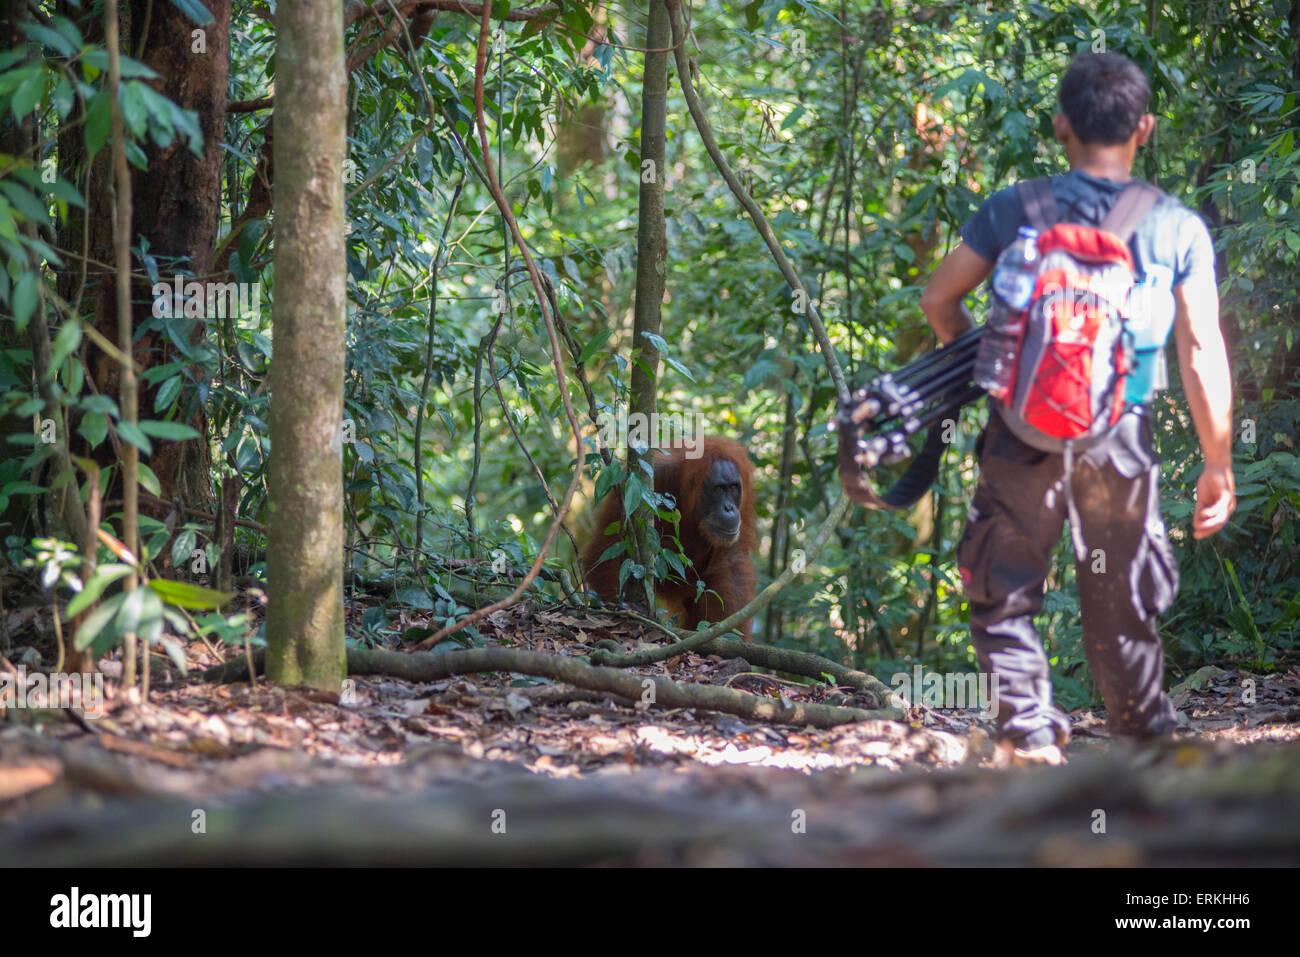 Sumatran orangutan, Pongo abelii, Gunung Leuser National Park, northern Sumatra, Indonesia. Stock Photo